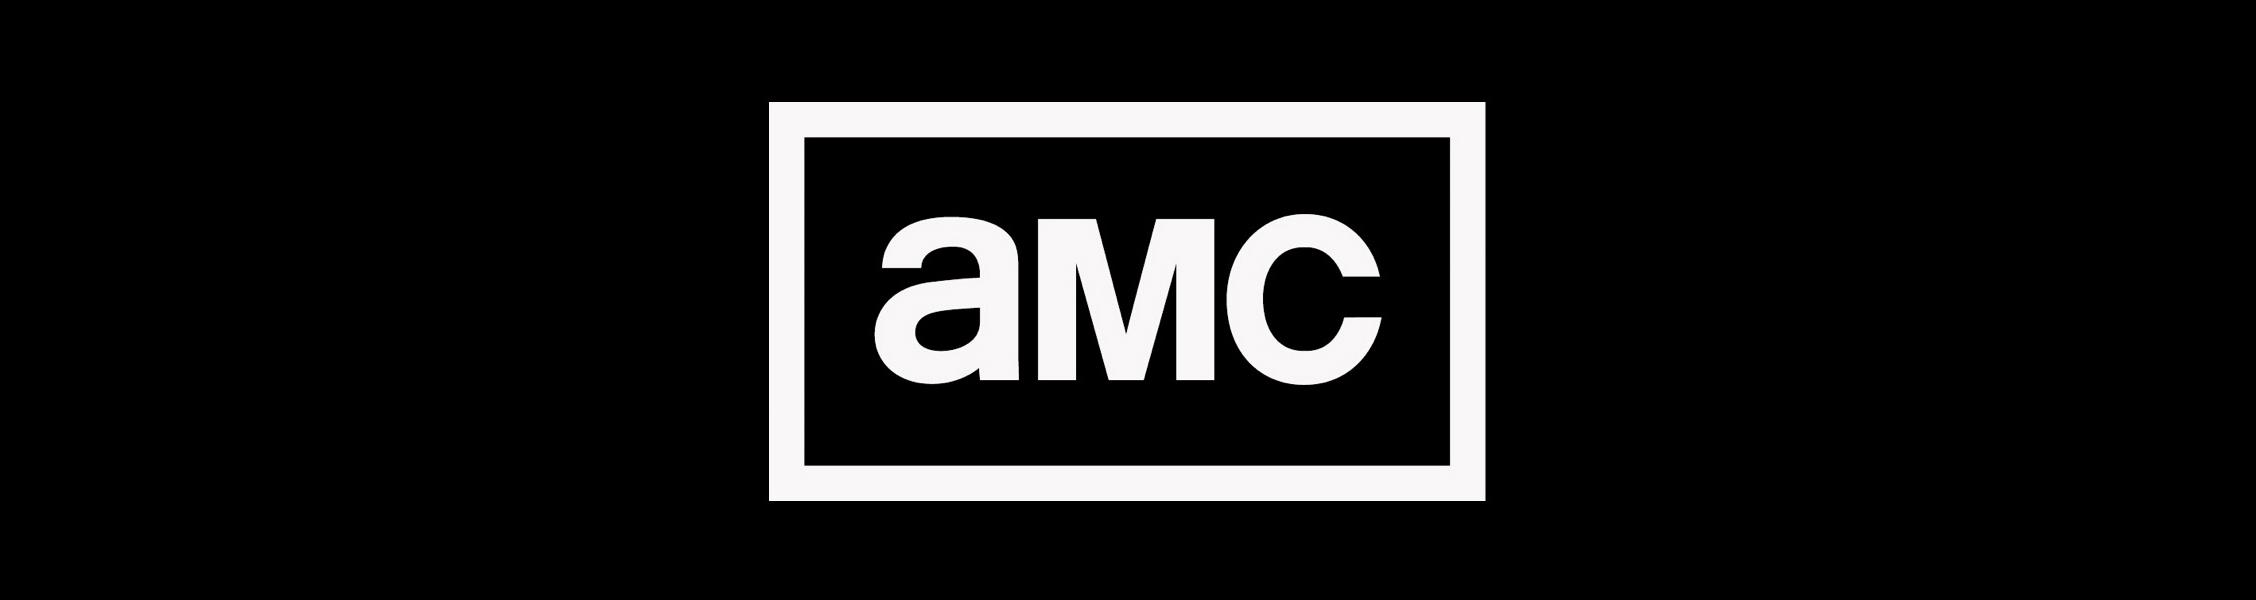 amc-banner